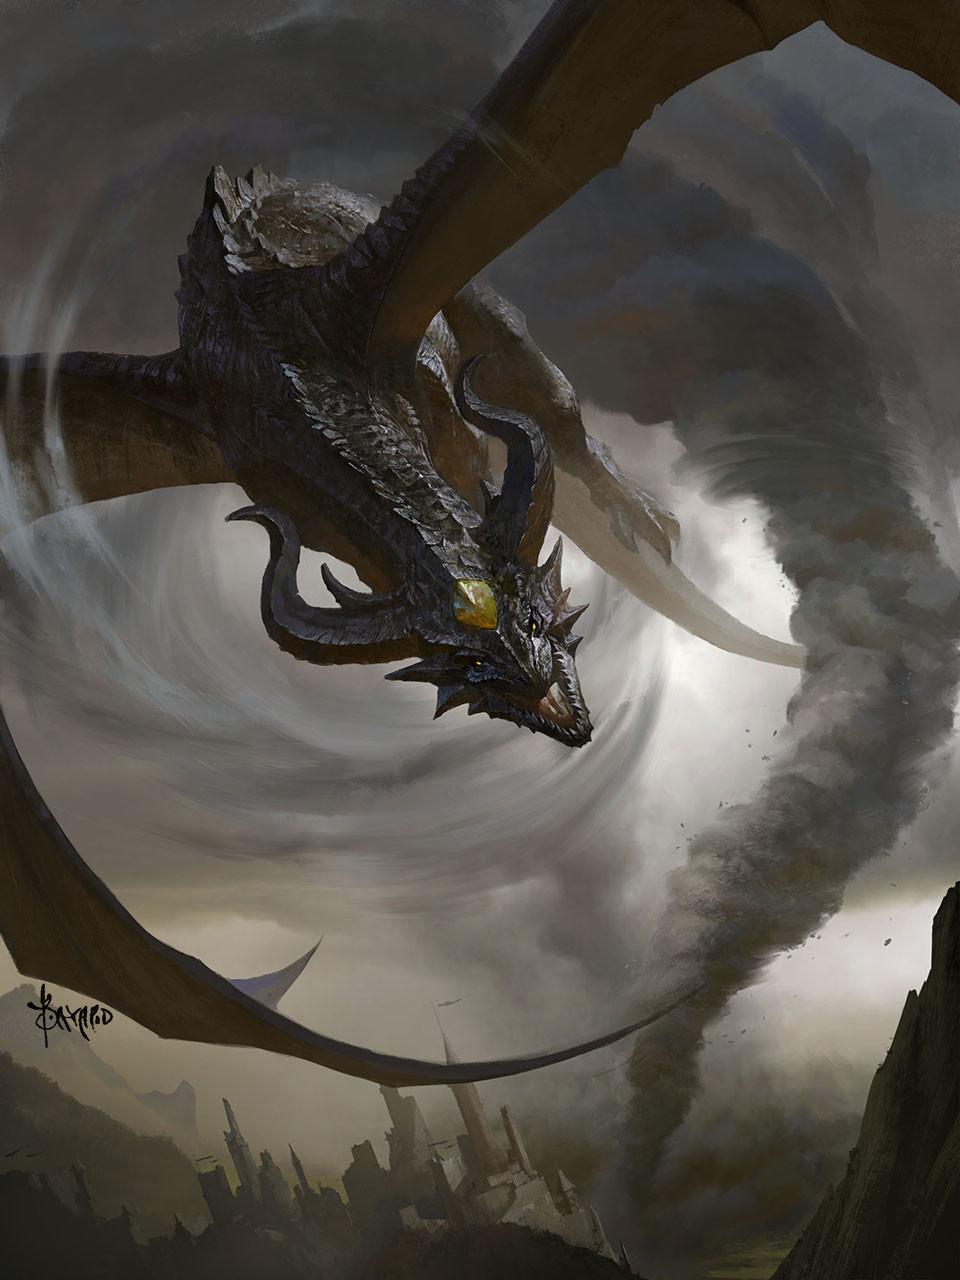 Bayard wu storm dragon